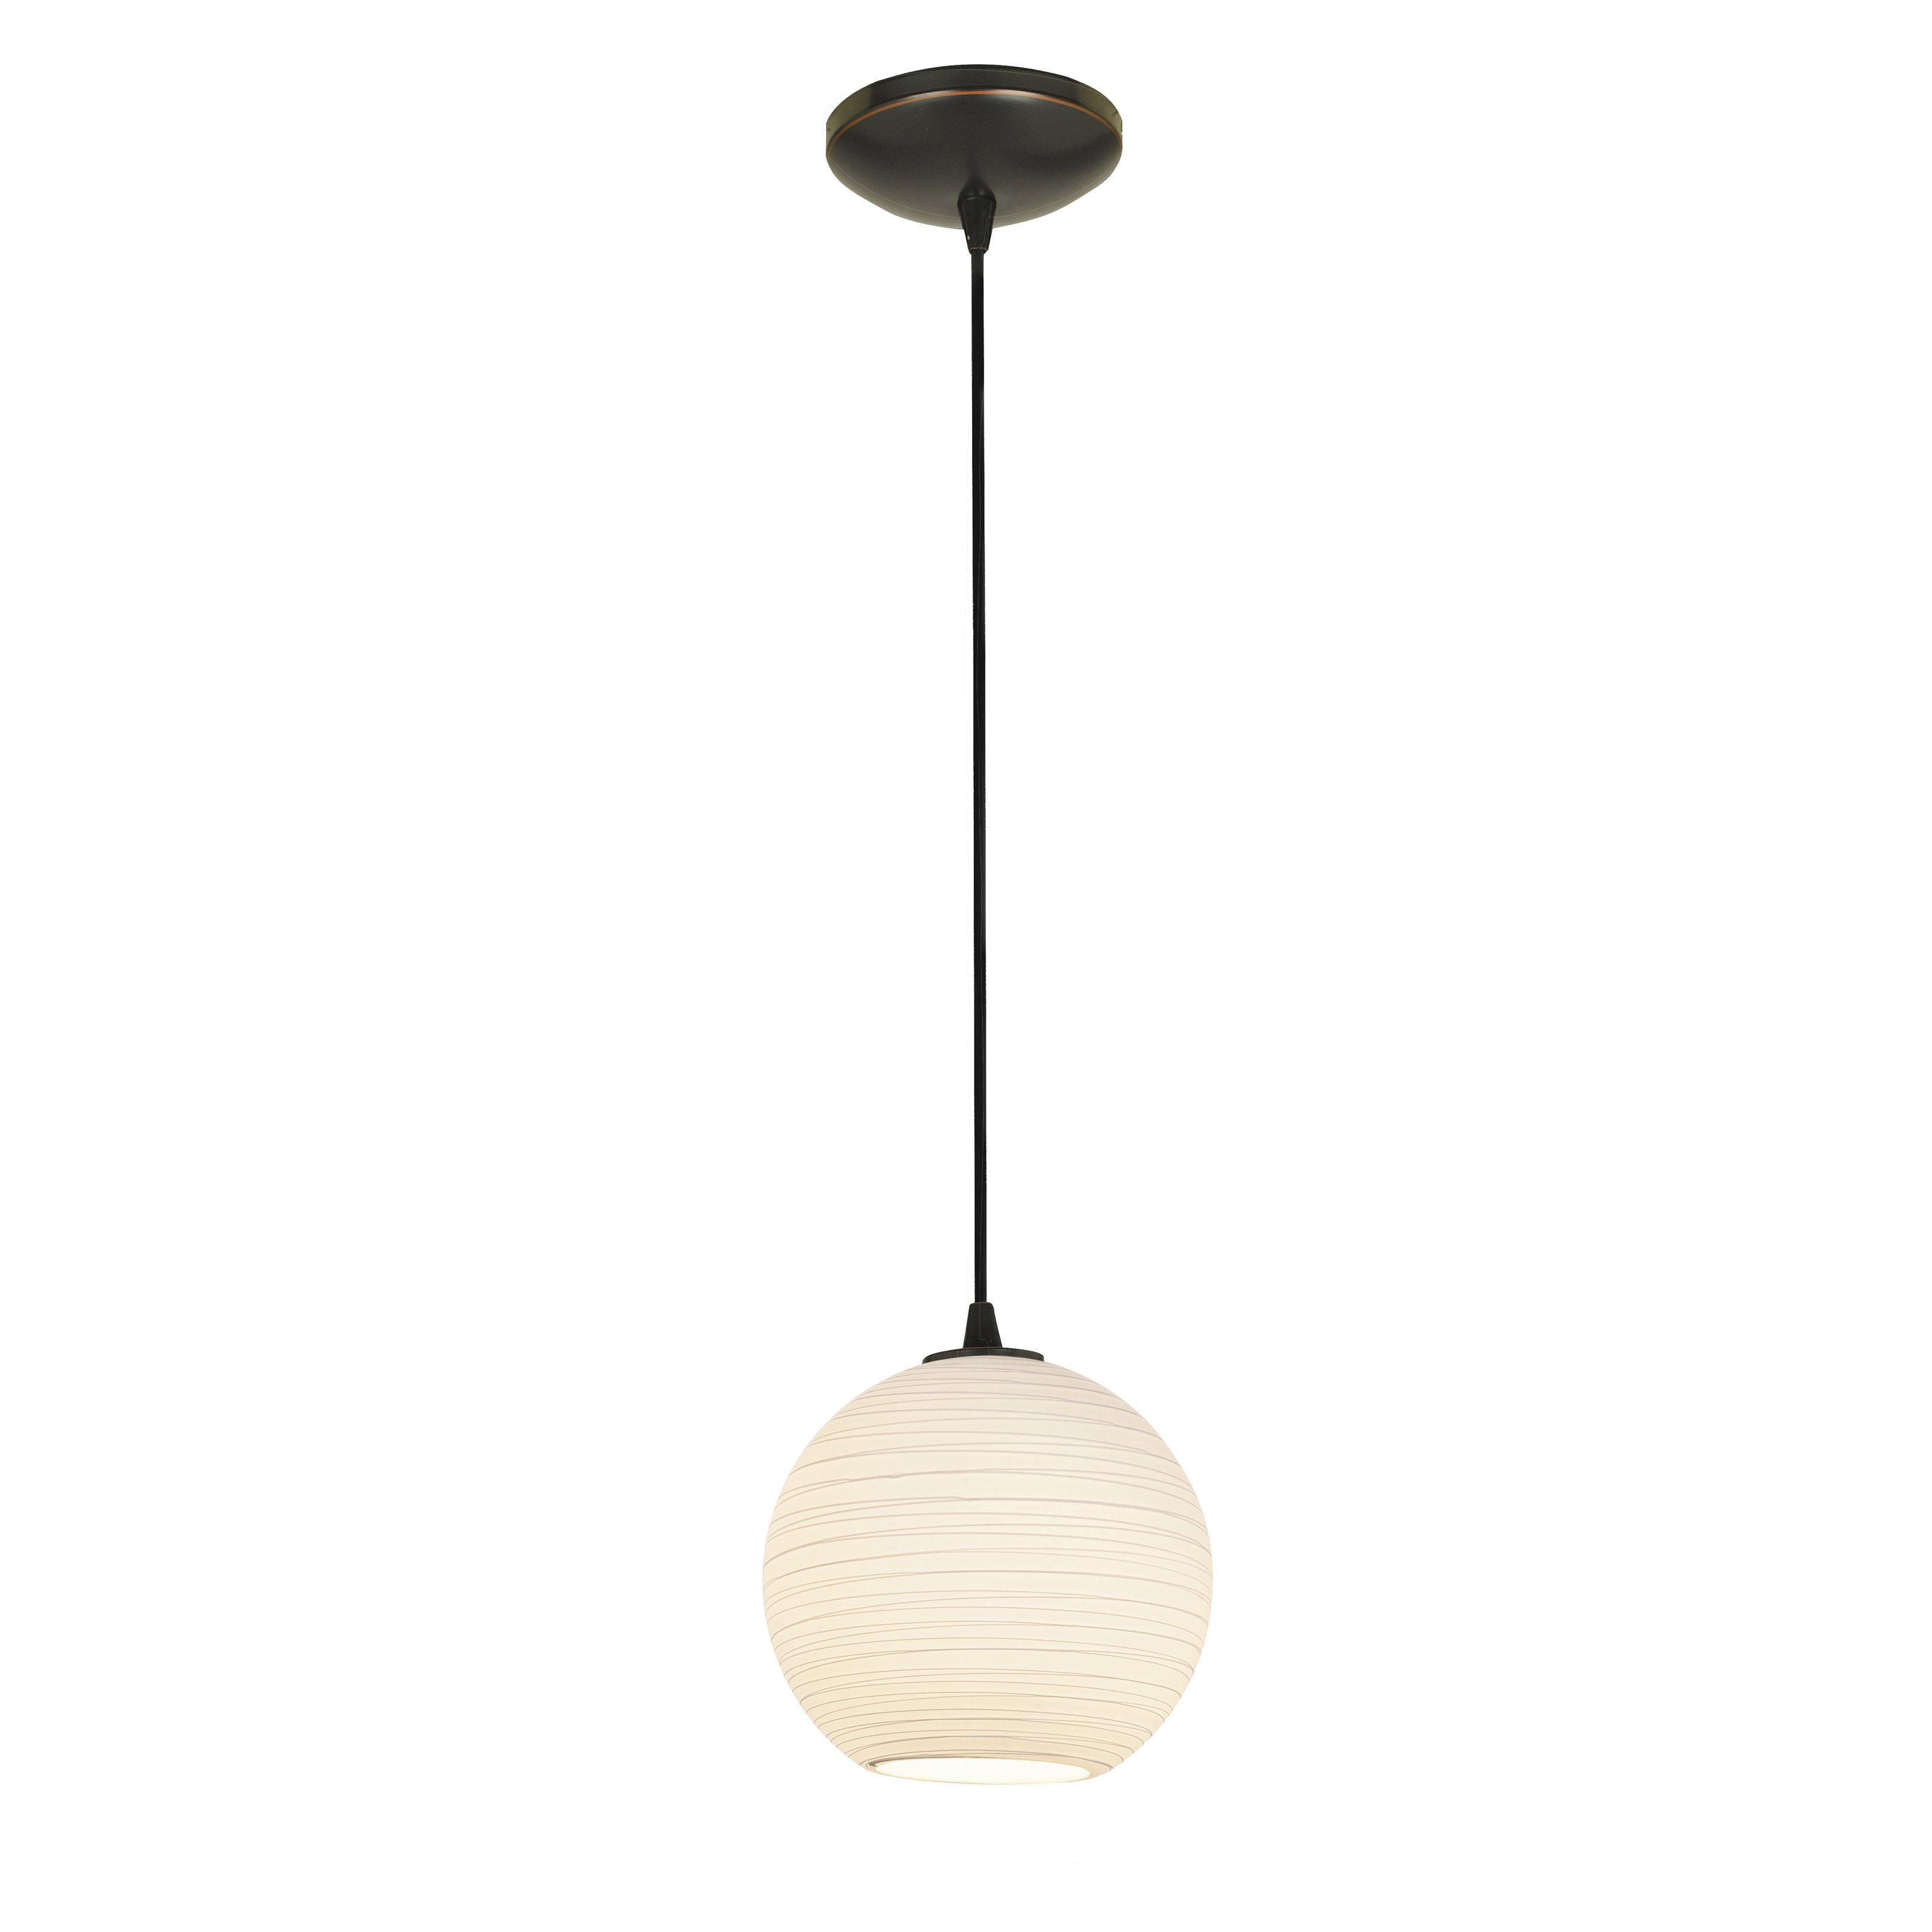 Access Lighting Lantern Pendant 23643 - 8W in.